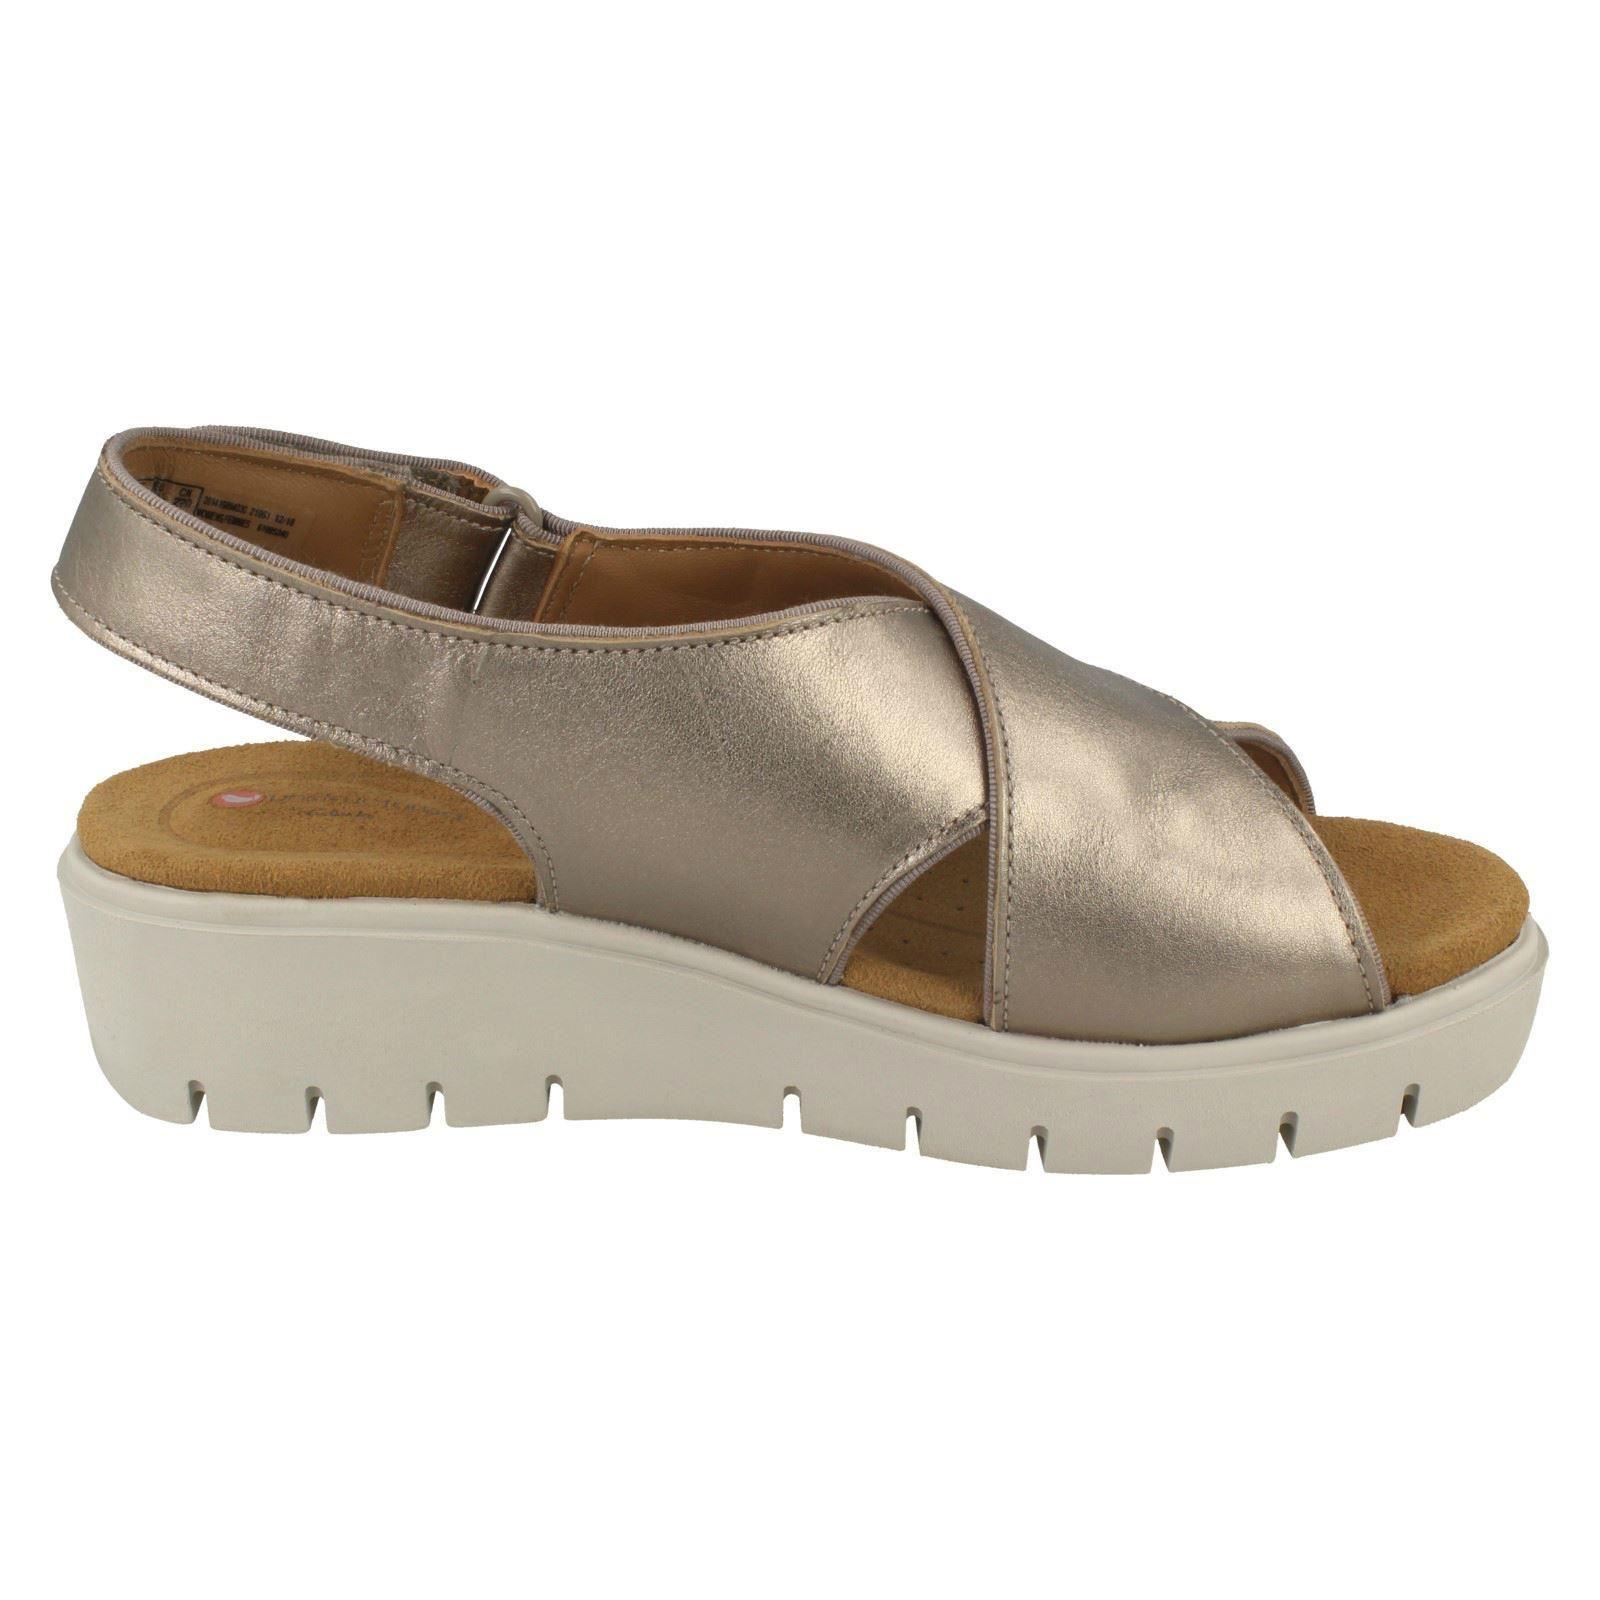 d09677a53c Ladies Clarks Unstructured Wedge Slingback Sandals - Un Karely Sun ...